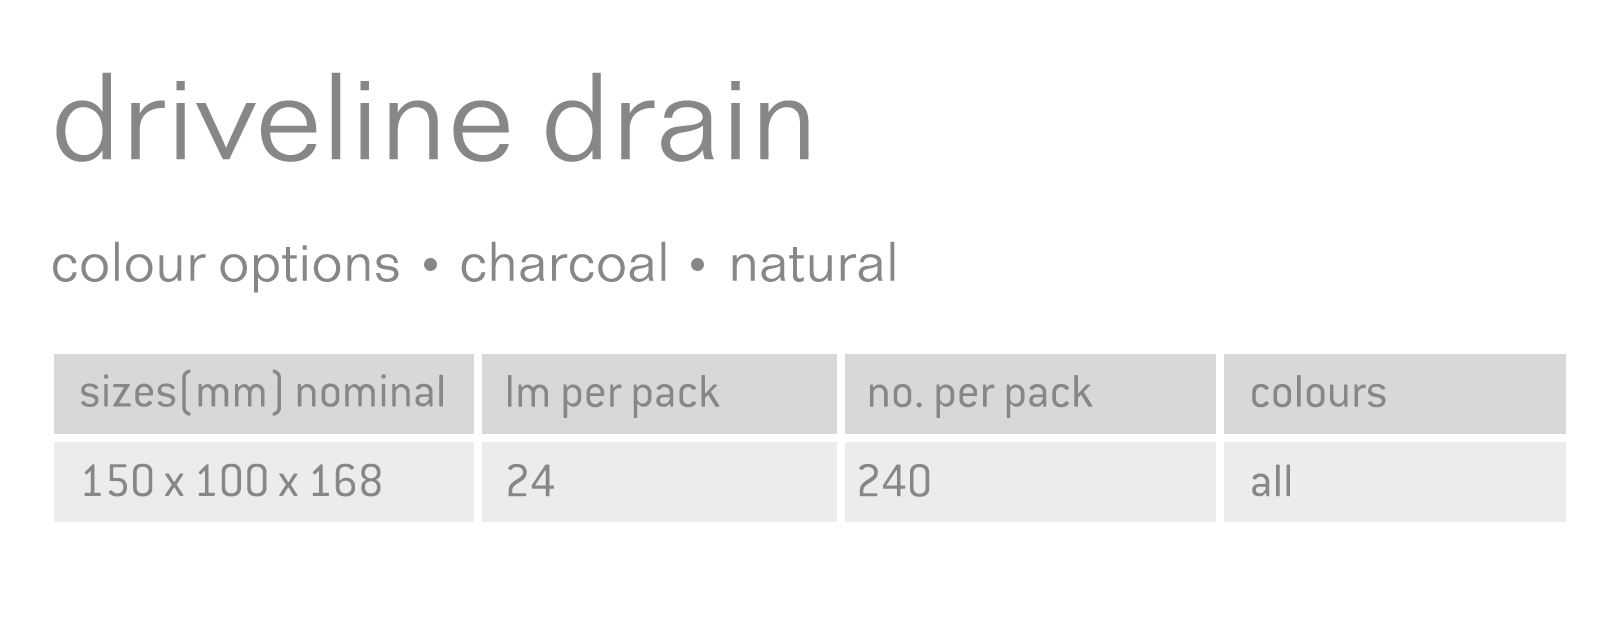 driveline drain Specification